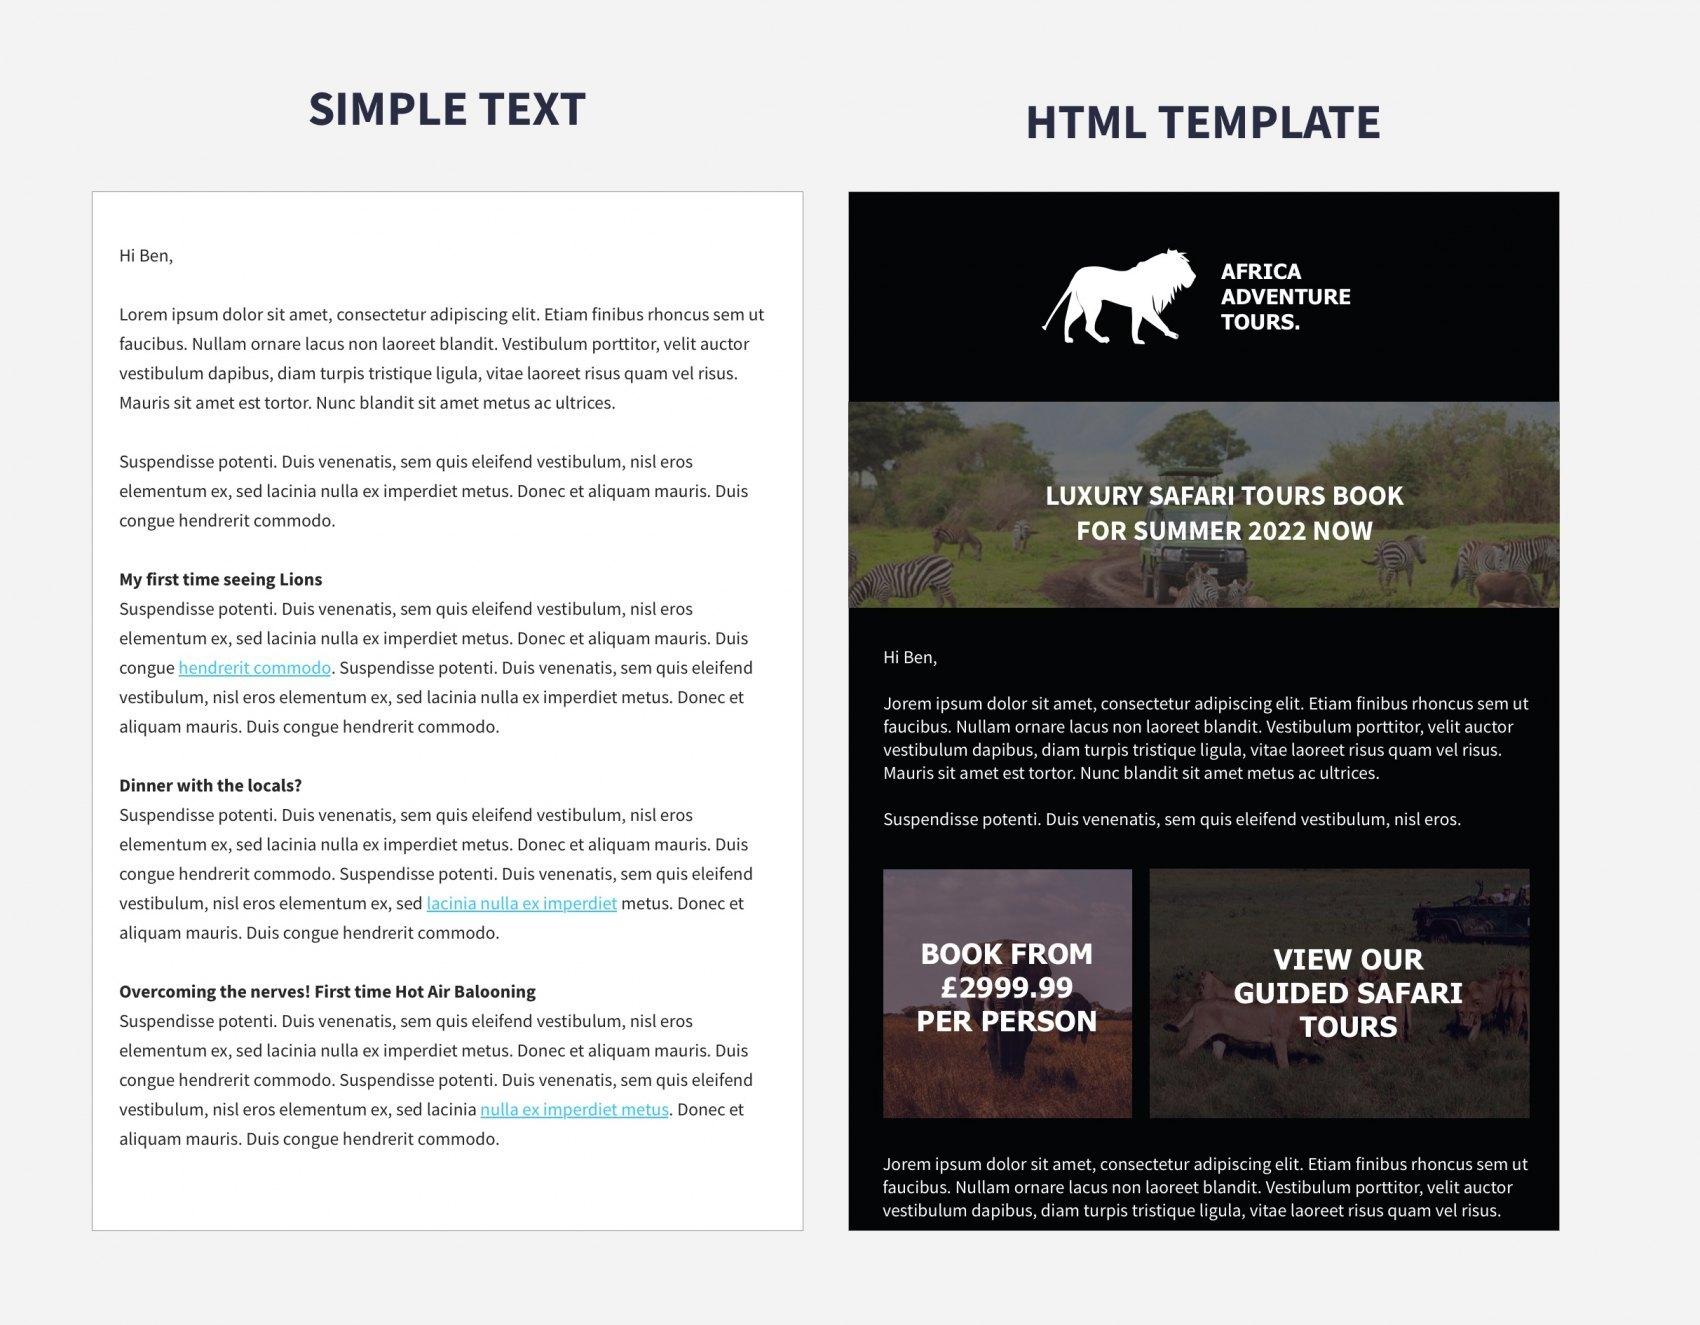 Simple Text Versus HTML Email Comparison